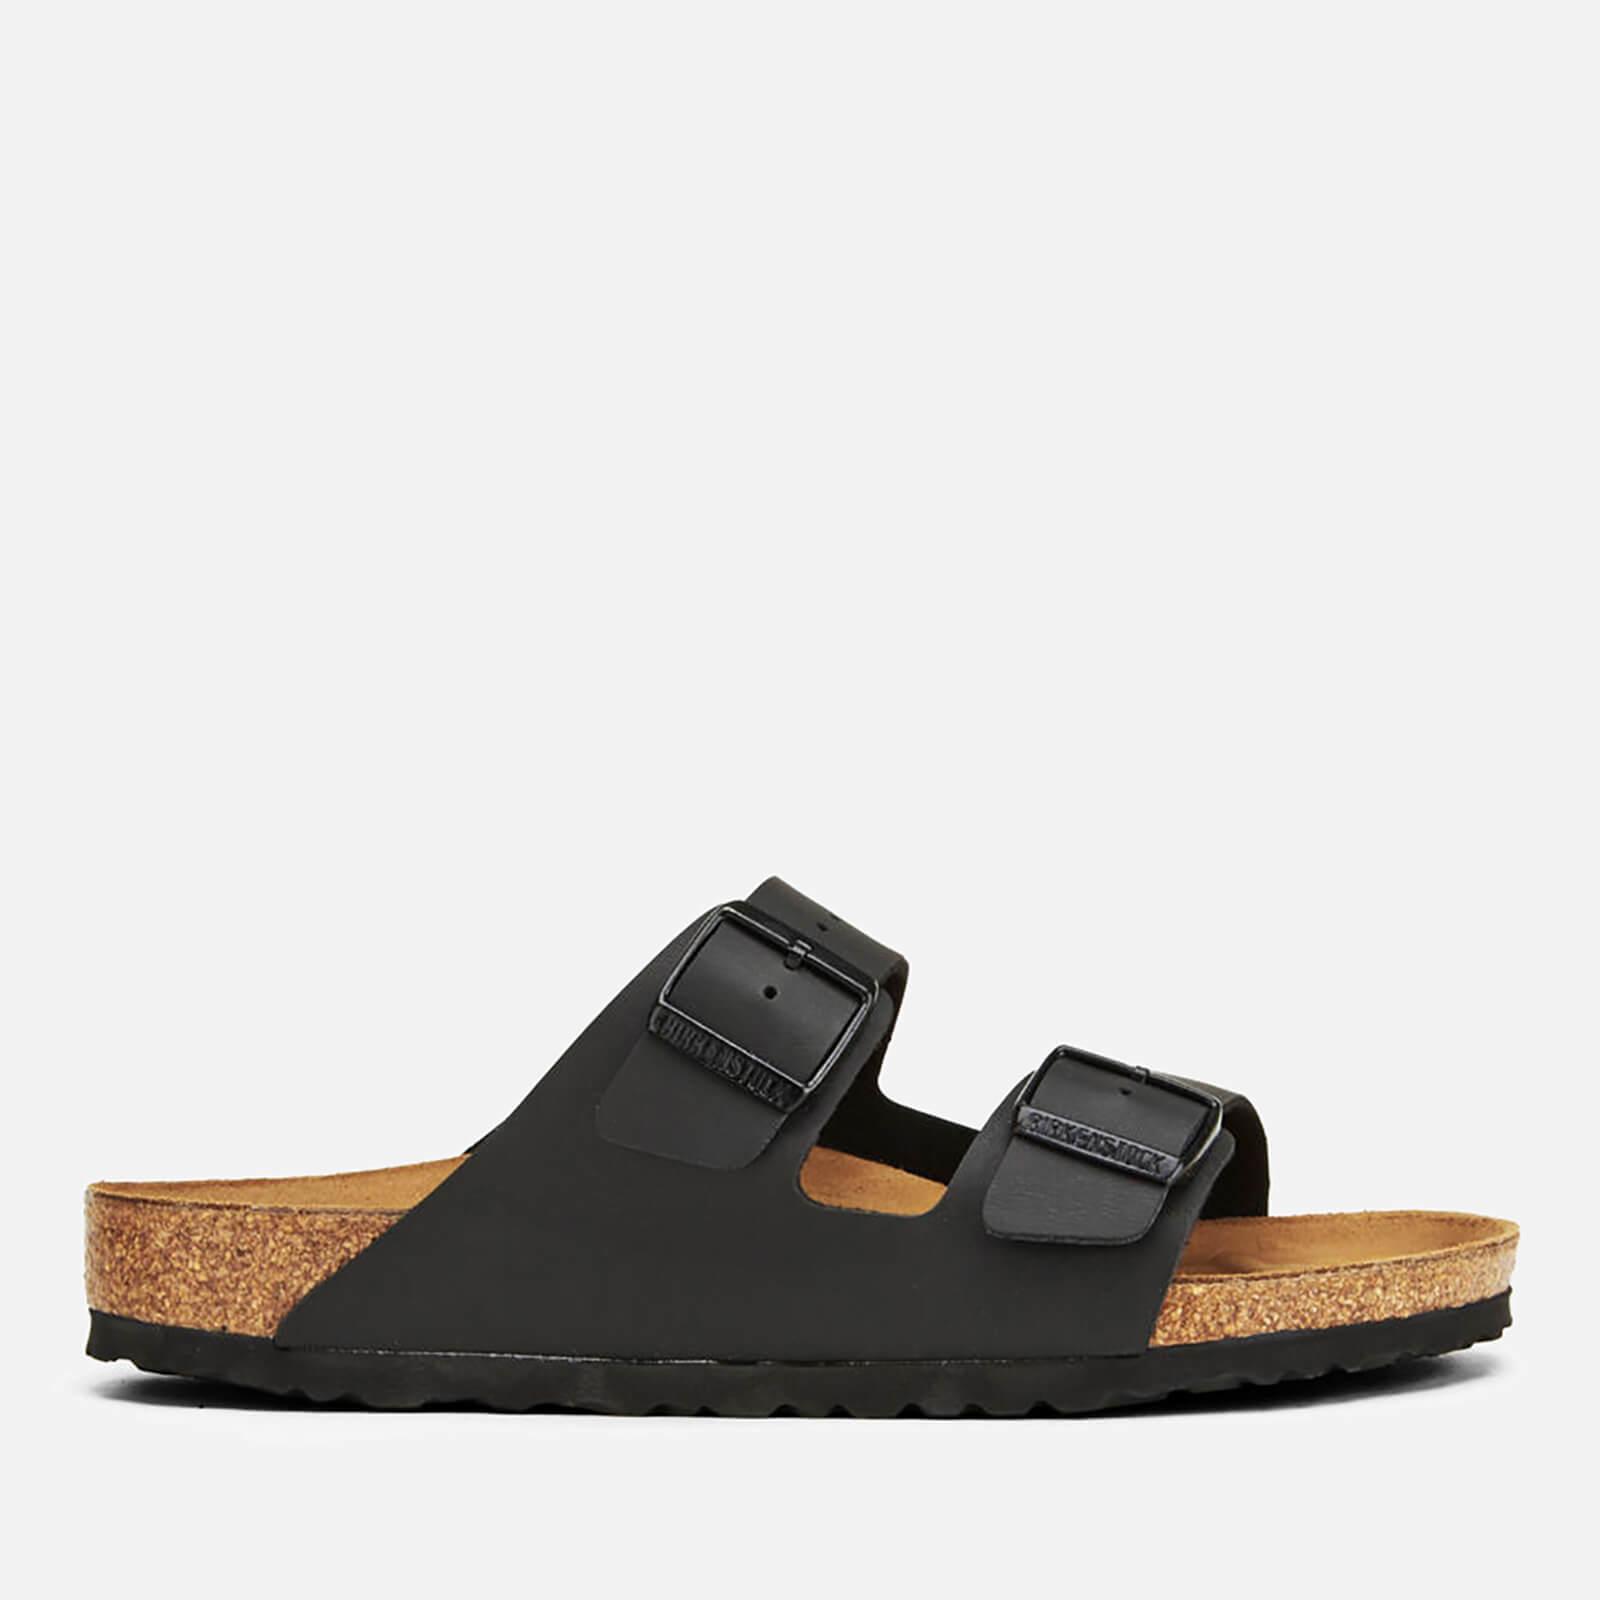 e6ff3de785f4 Birkenstock Men s Arizona Double Strap Sandals - Black Mens Footwear ...